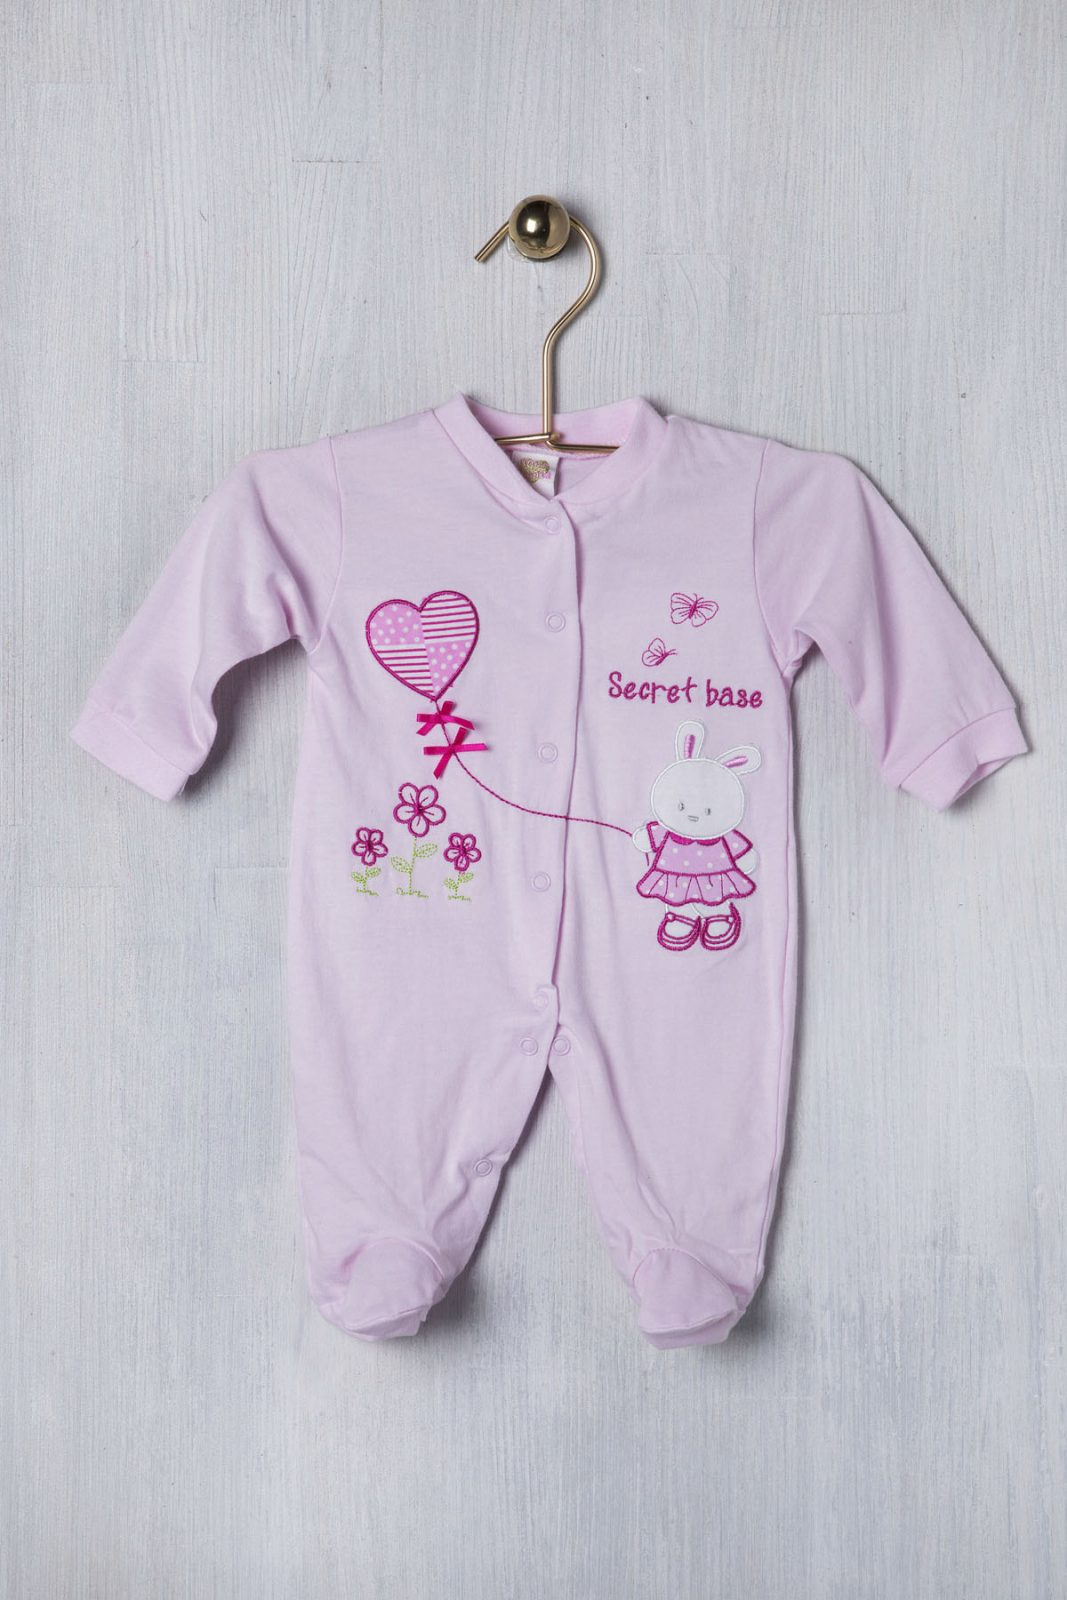 5b9c5766605 Βρεφικά φορμάκια για Κορίτσια - Ersas Παιδικά, Βρεφικά Ρούχα